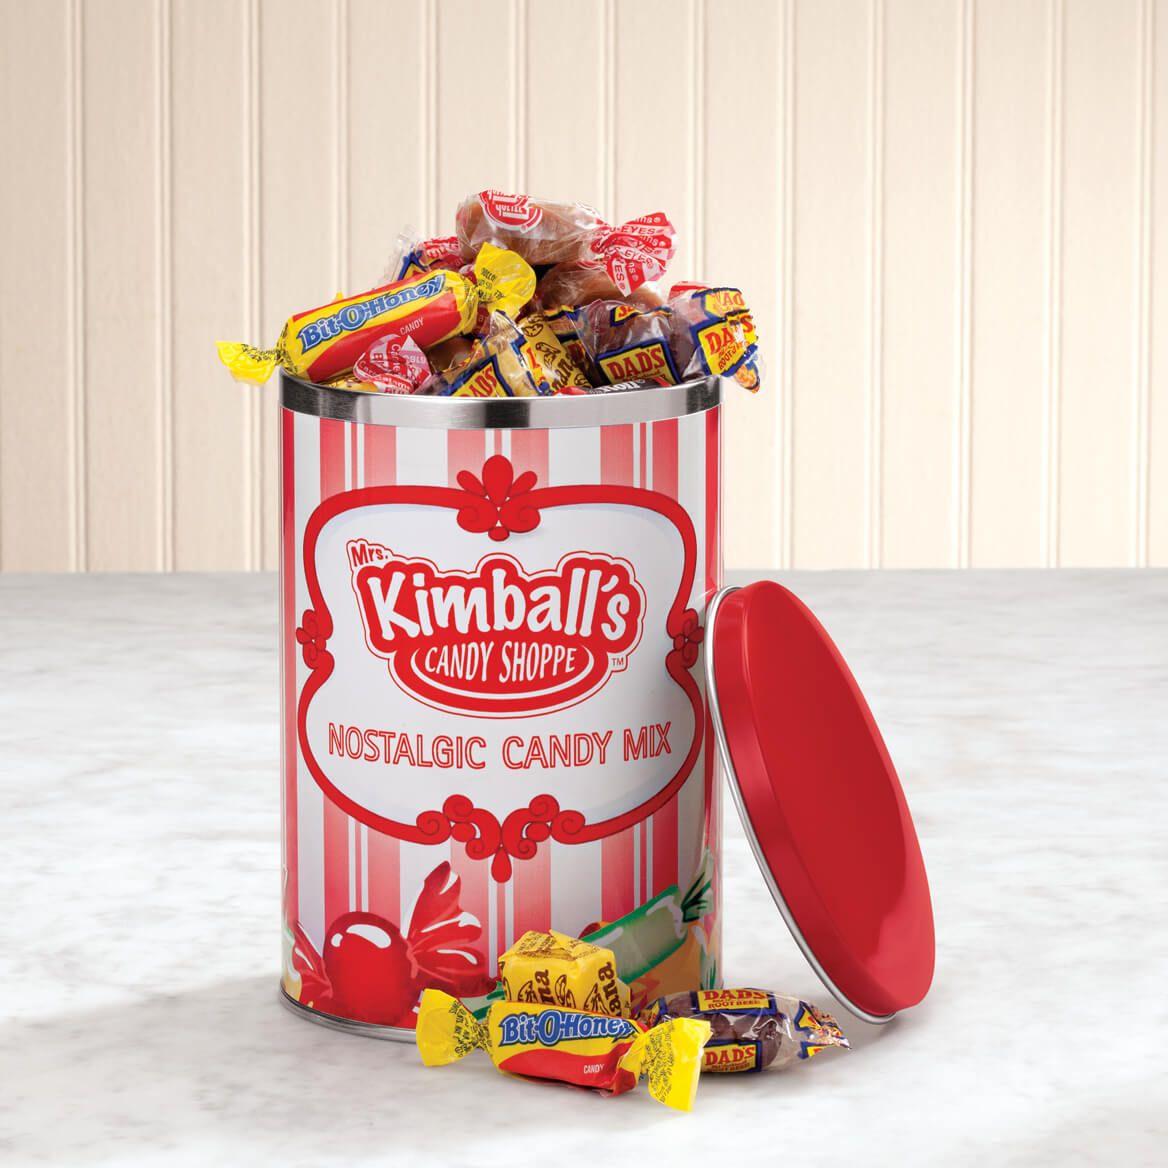 Mrs. Kimball's Candy Shoppe Nostalgic Candy Mix Keepsake Tin-357626